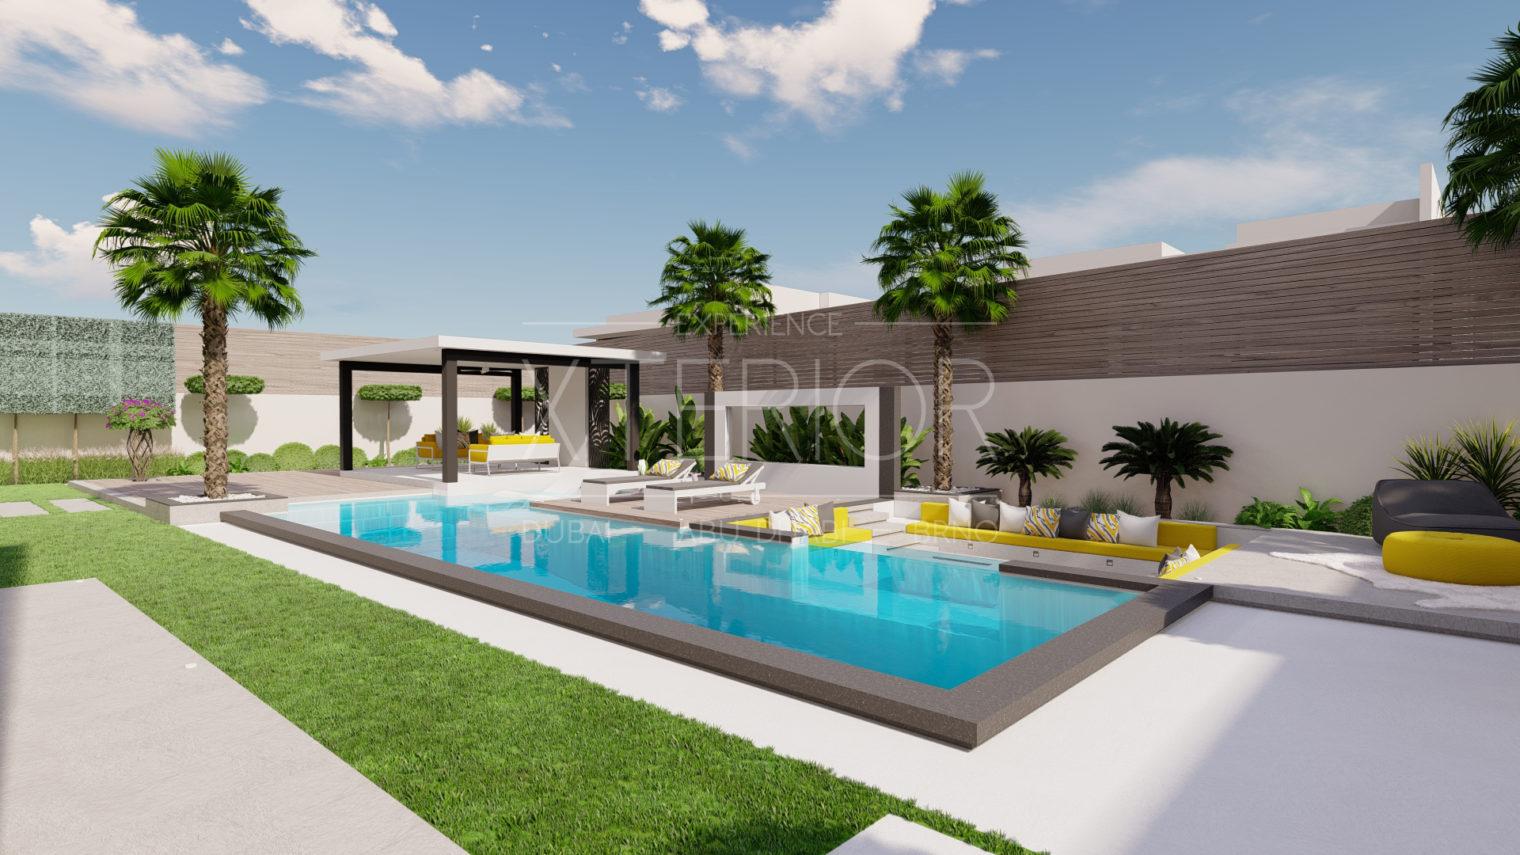 Swimming pool construction company Dubai